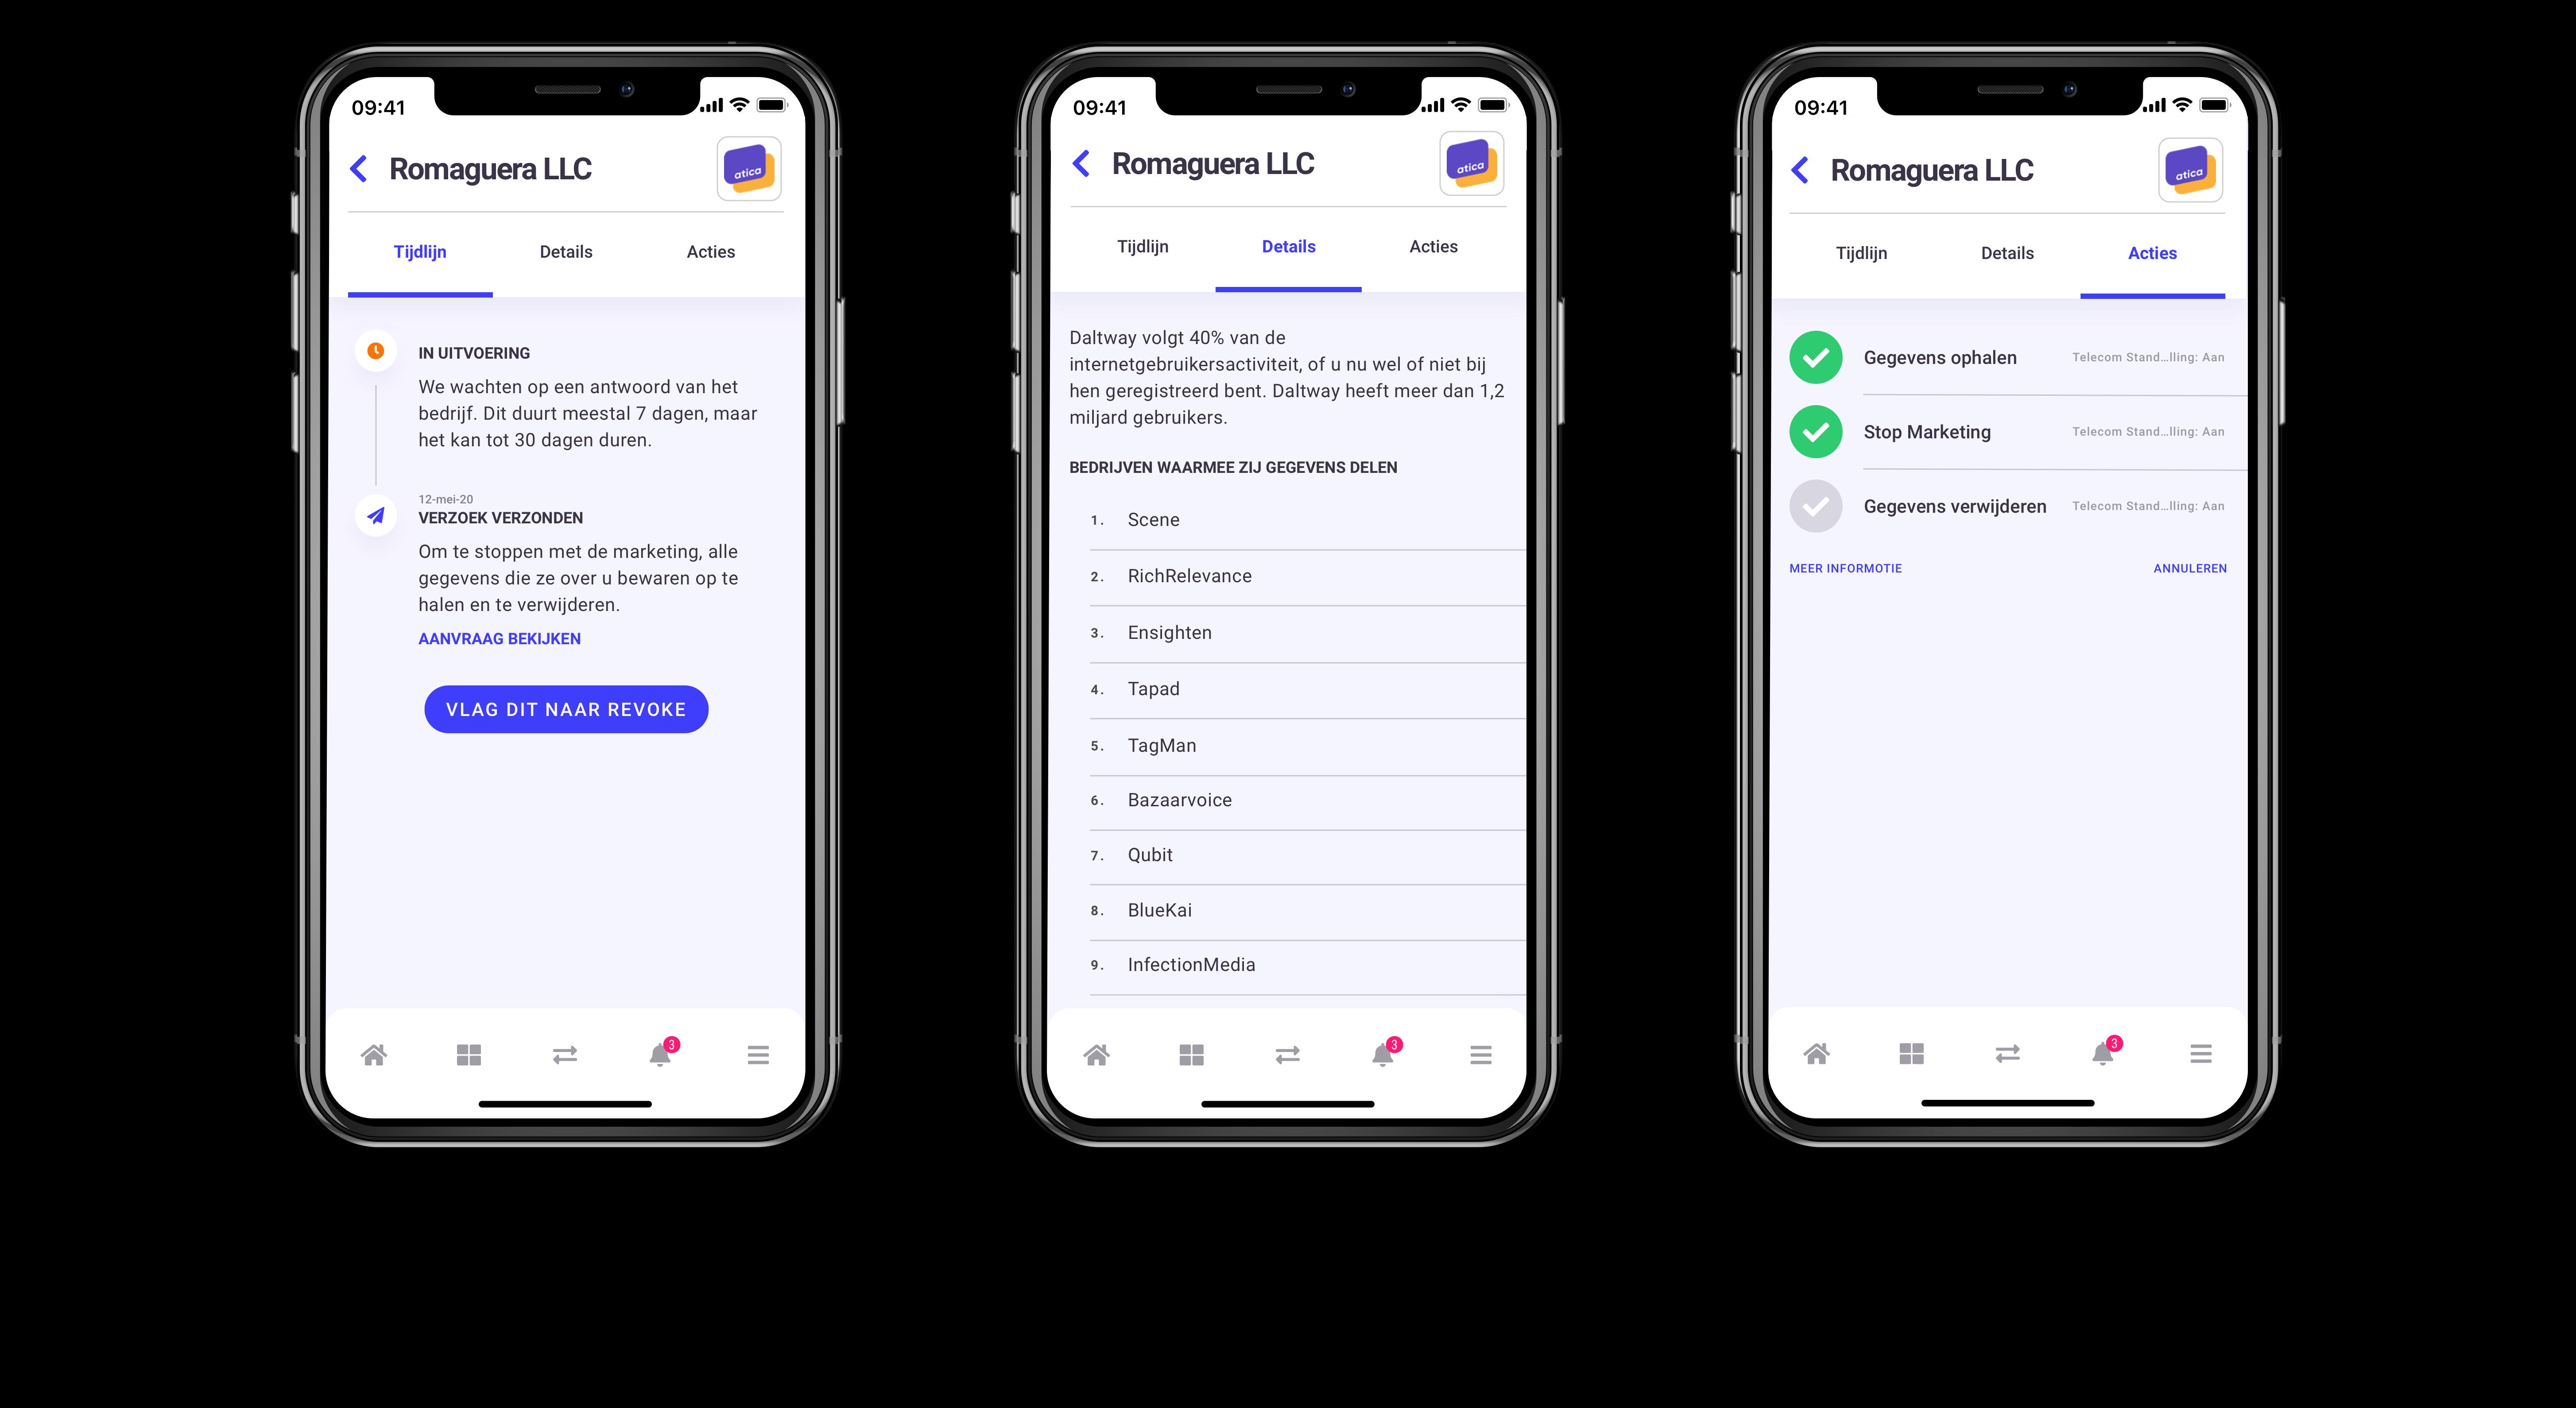 https://revoke.com/wp-content/uploads/2020/09/customer-submits-data-dutch.png